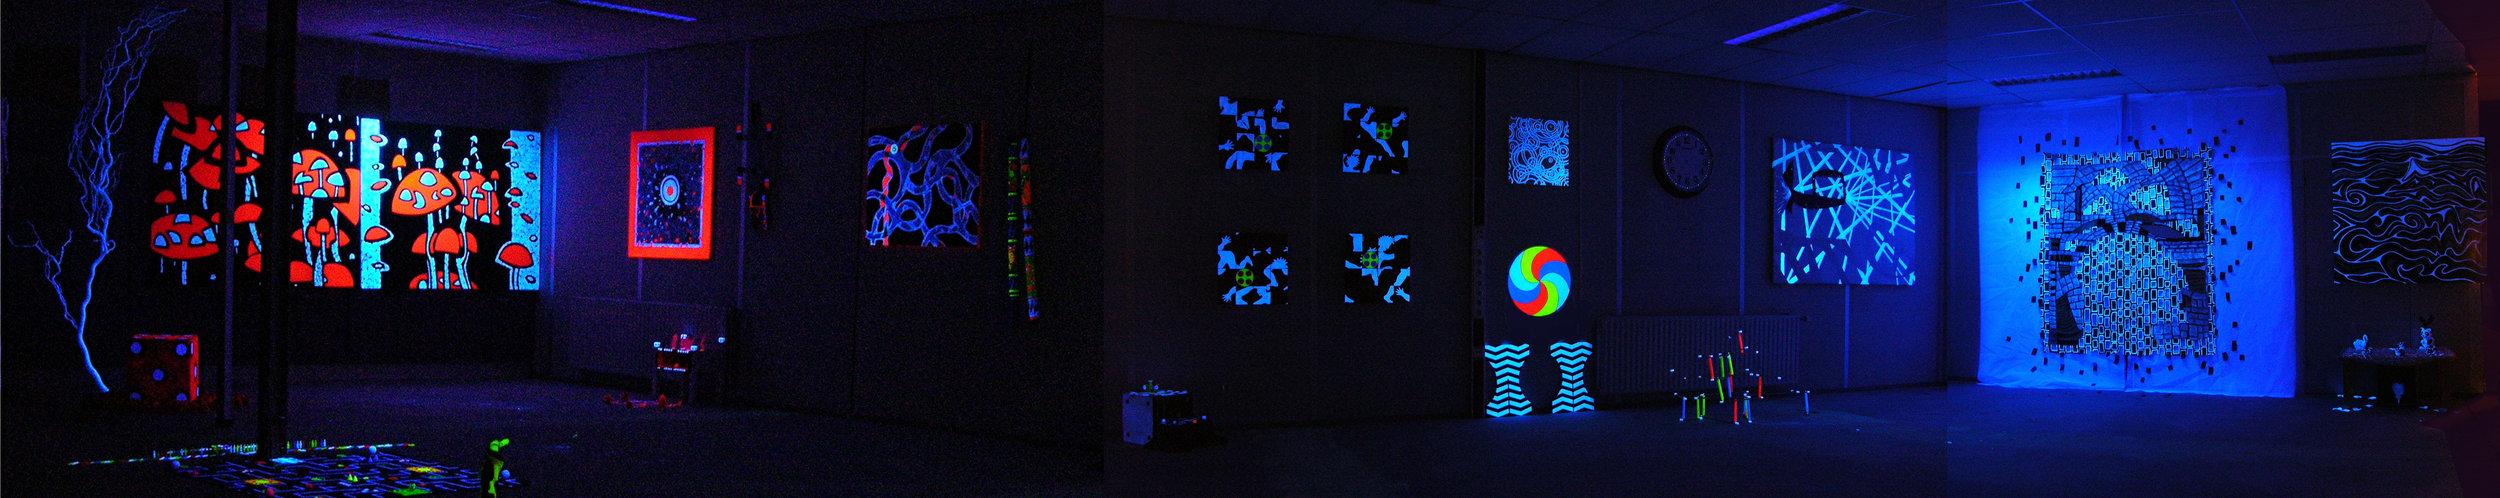 Blacklight-atelier.jpg